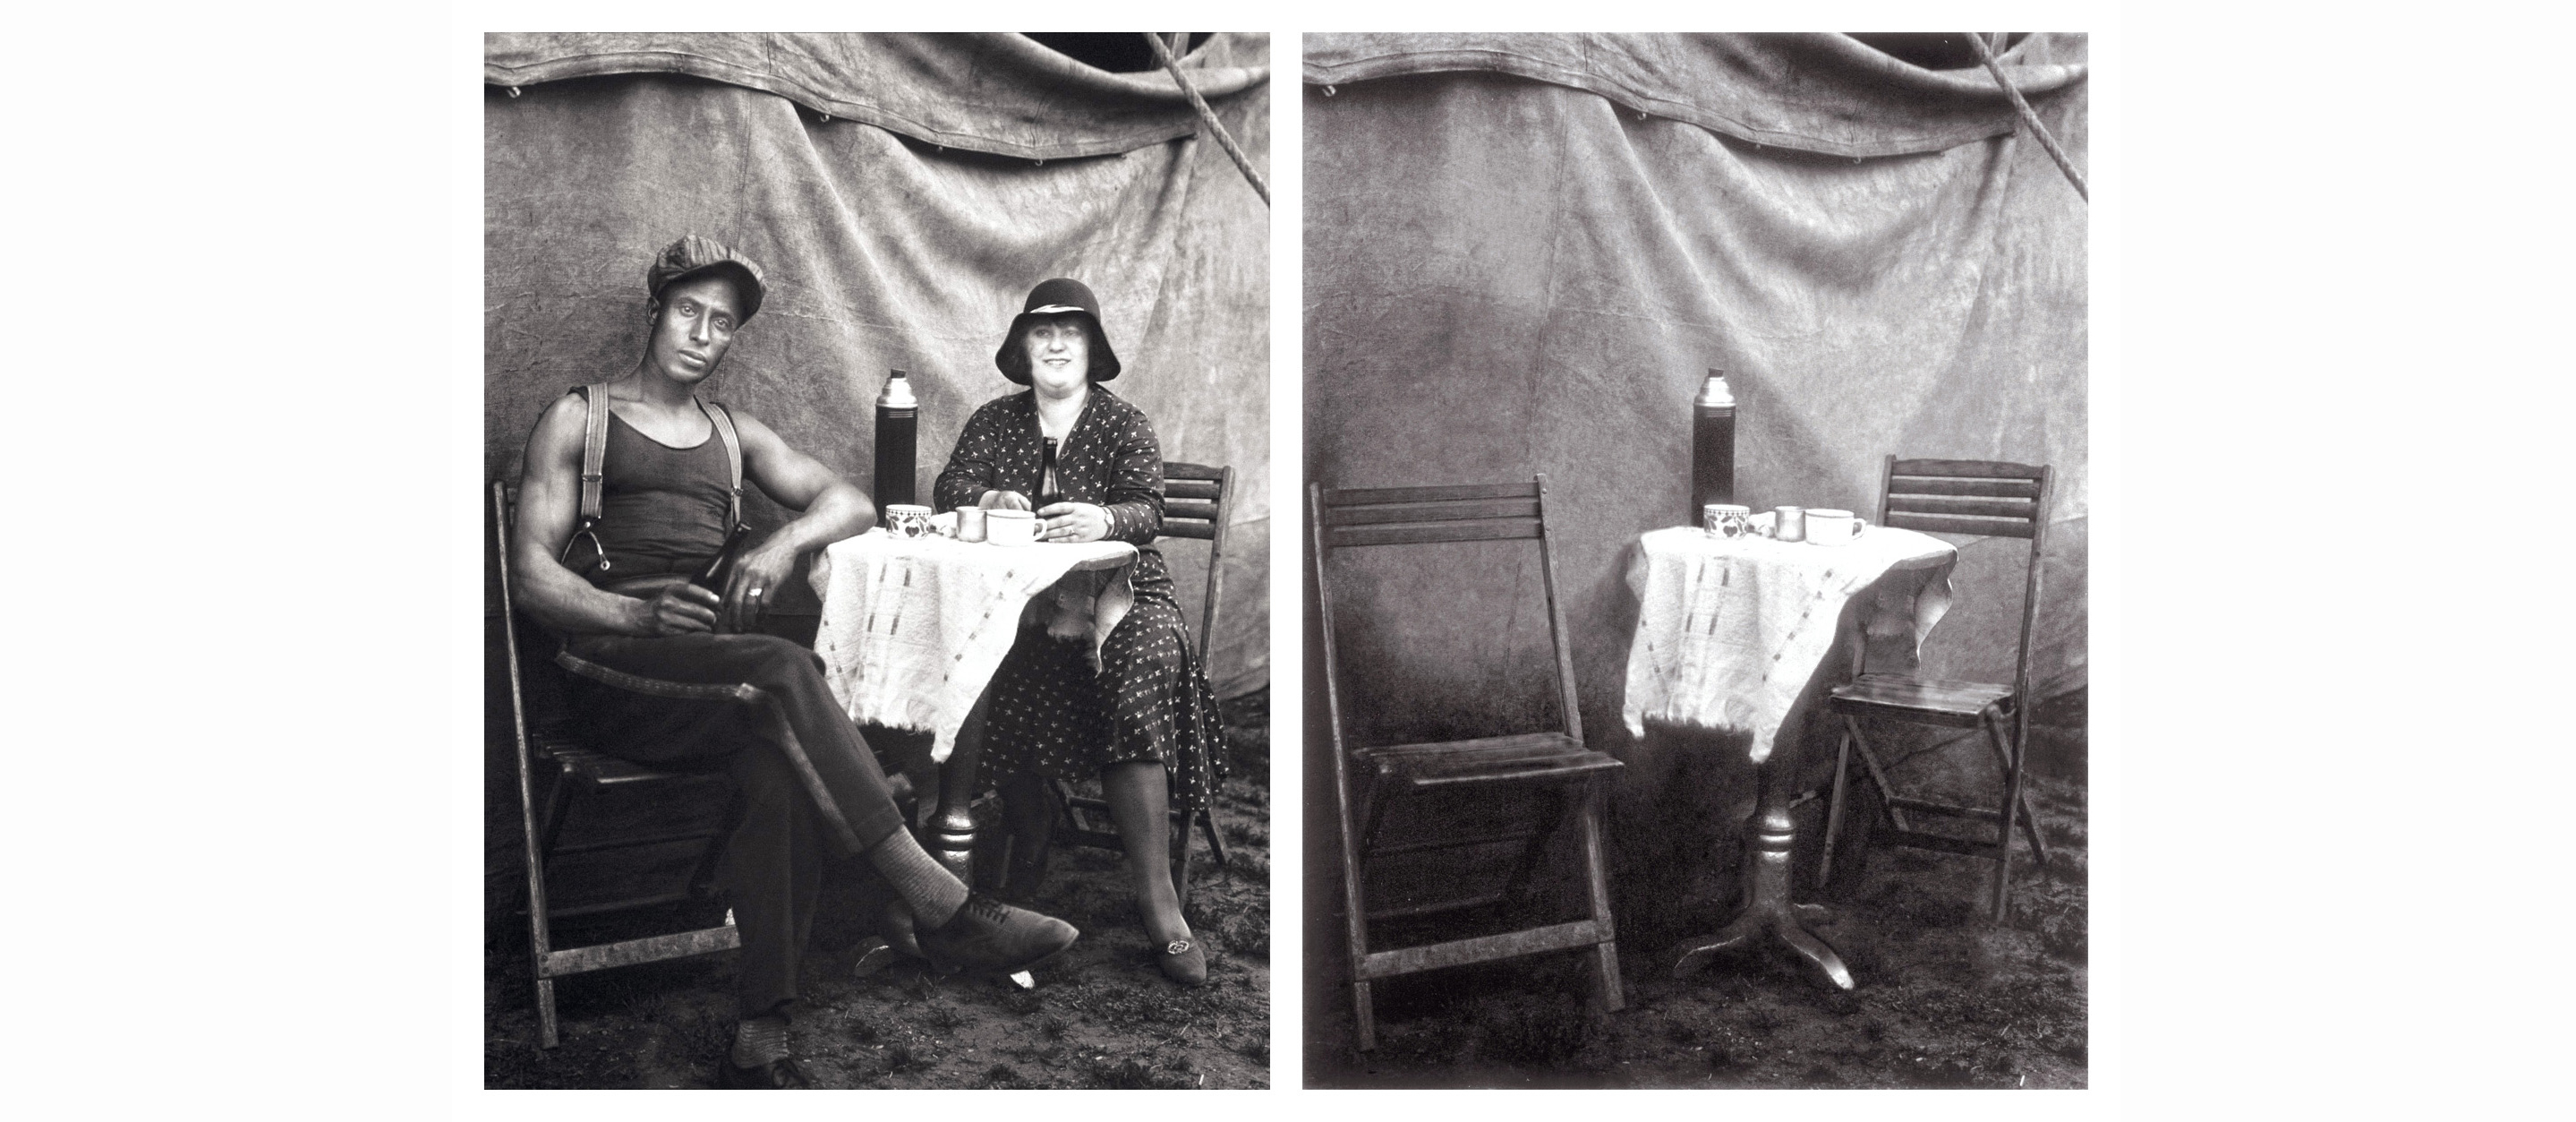 Hija-de-agricultor-1919-1-1169x1500 copy